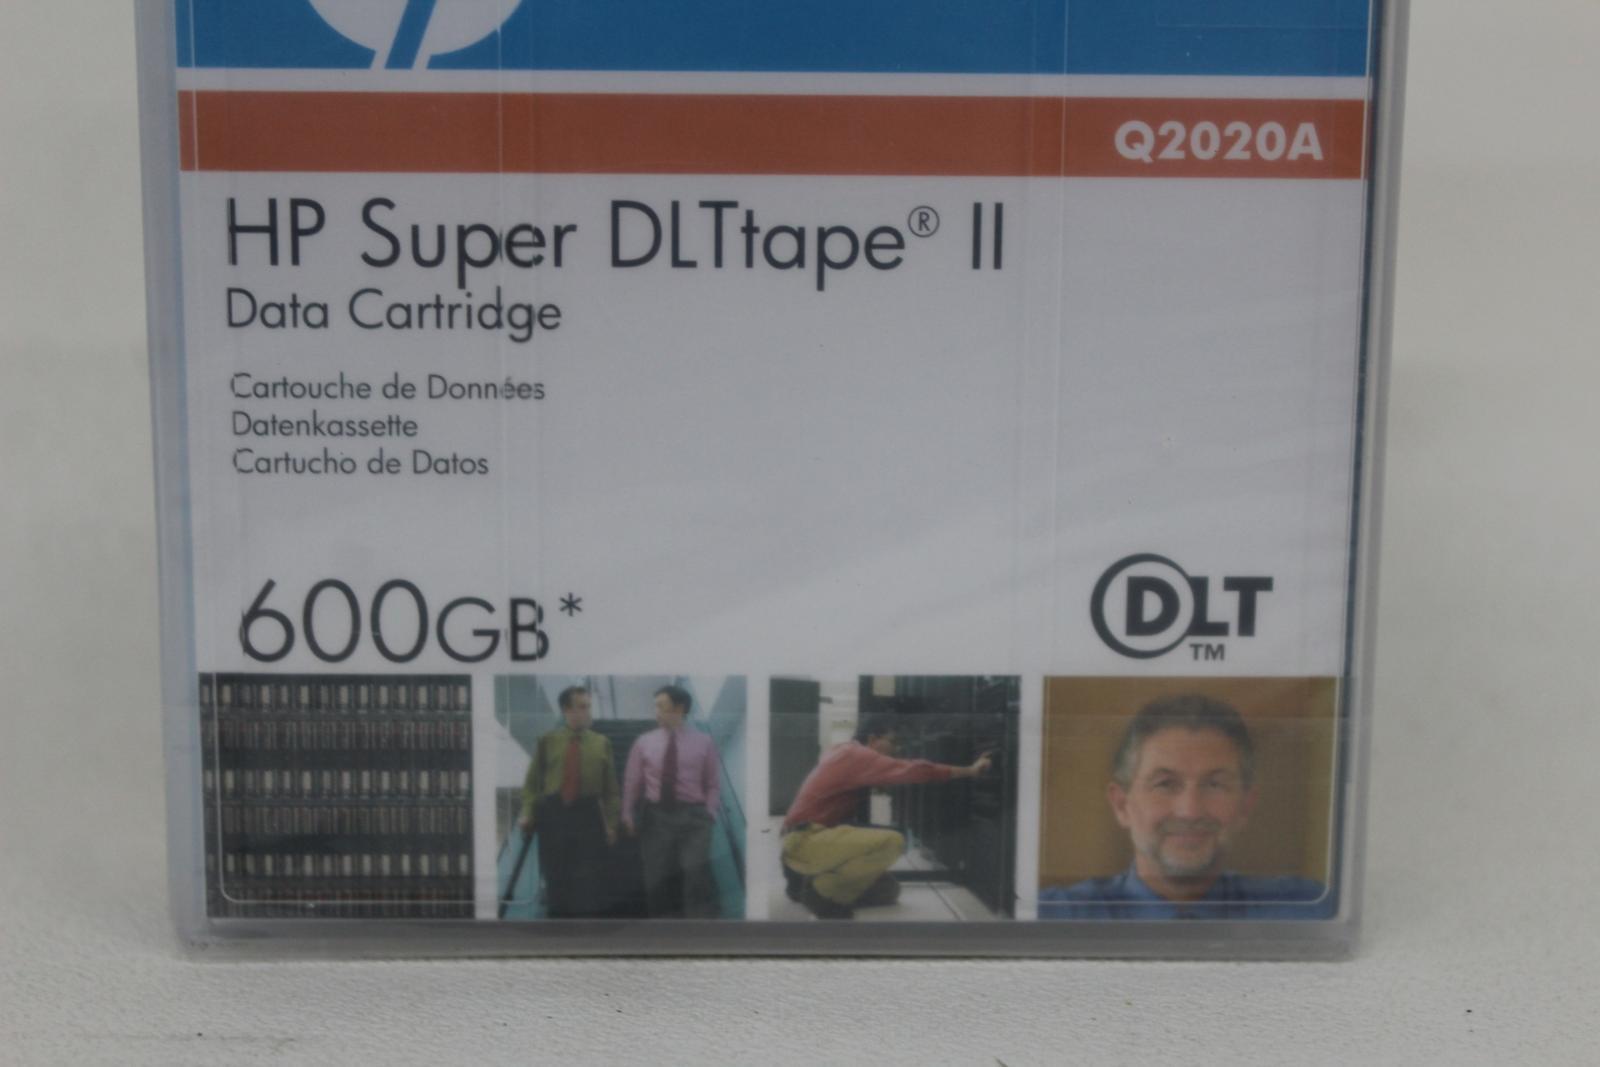 HP-Q2020A-Super-DLtape-II-Data-Tape-Square-cartouche-600-Go-job-lot-4x-NEUF miniature 6